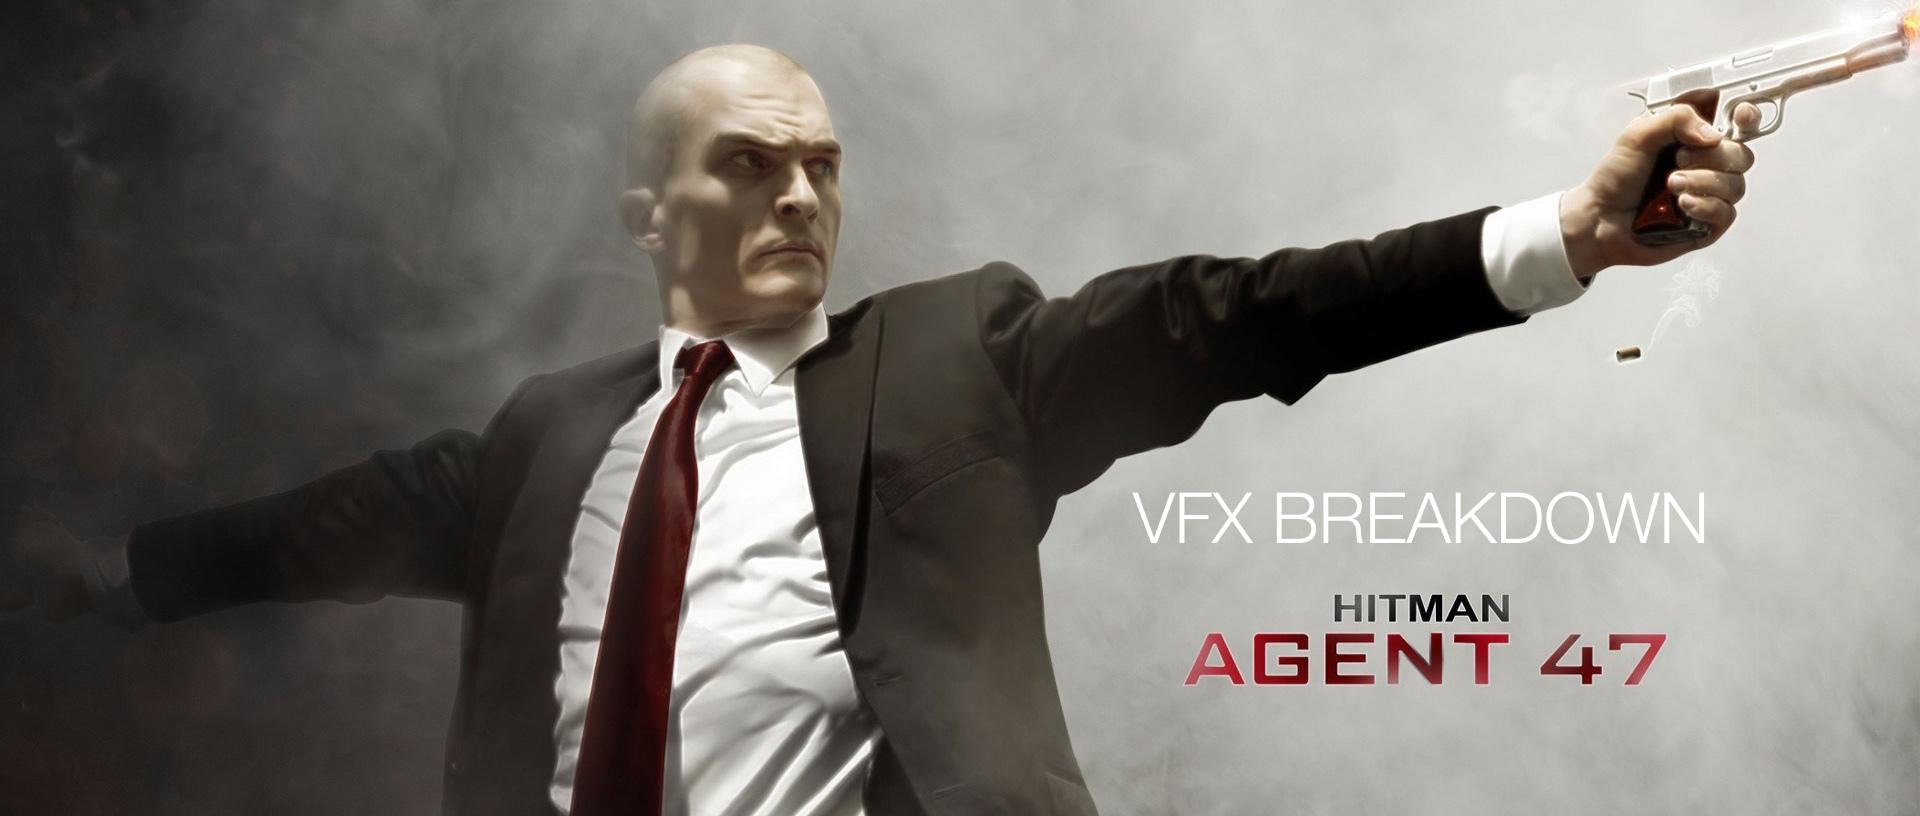 VFX_breakdown_Hitman_1